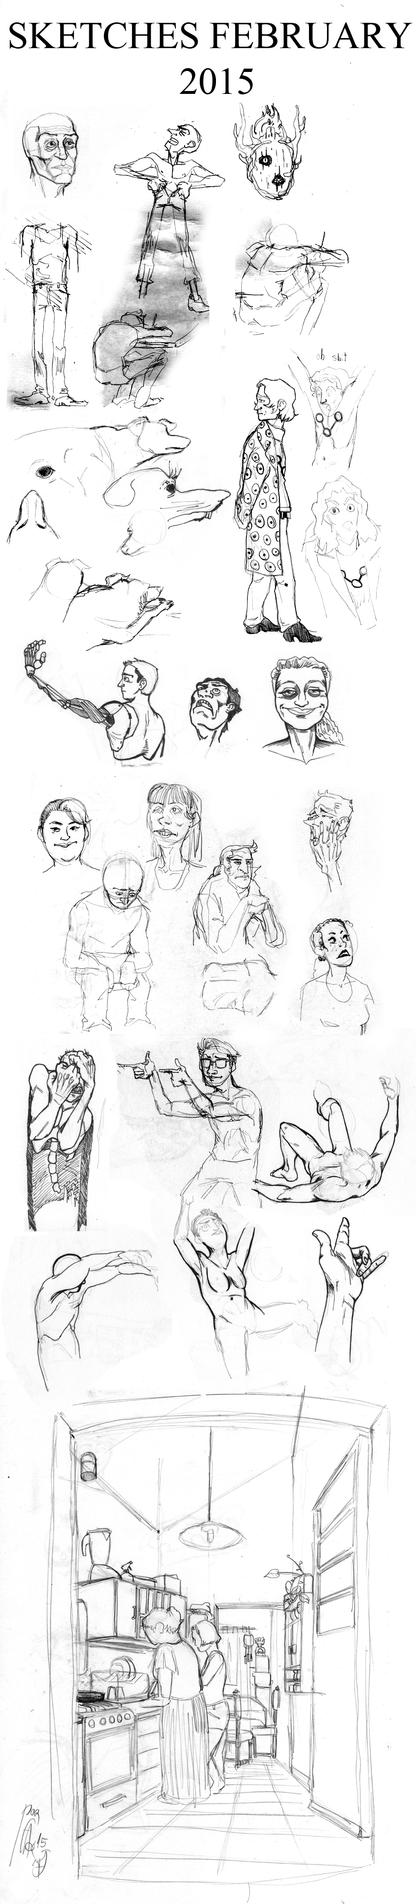 sketches february 2015 by faqundo